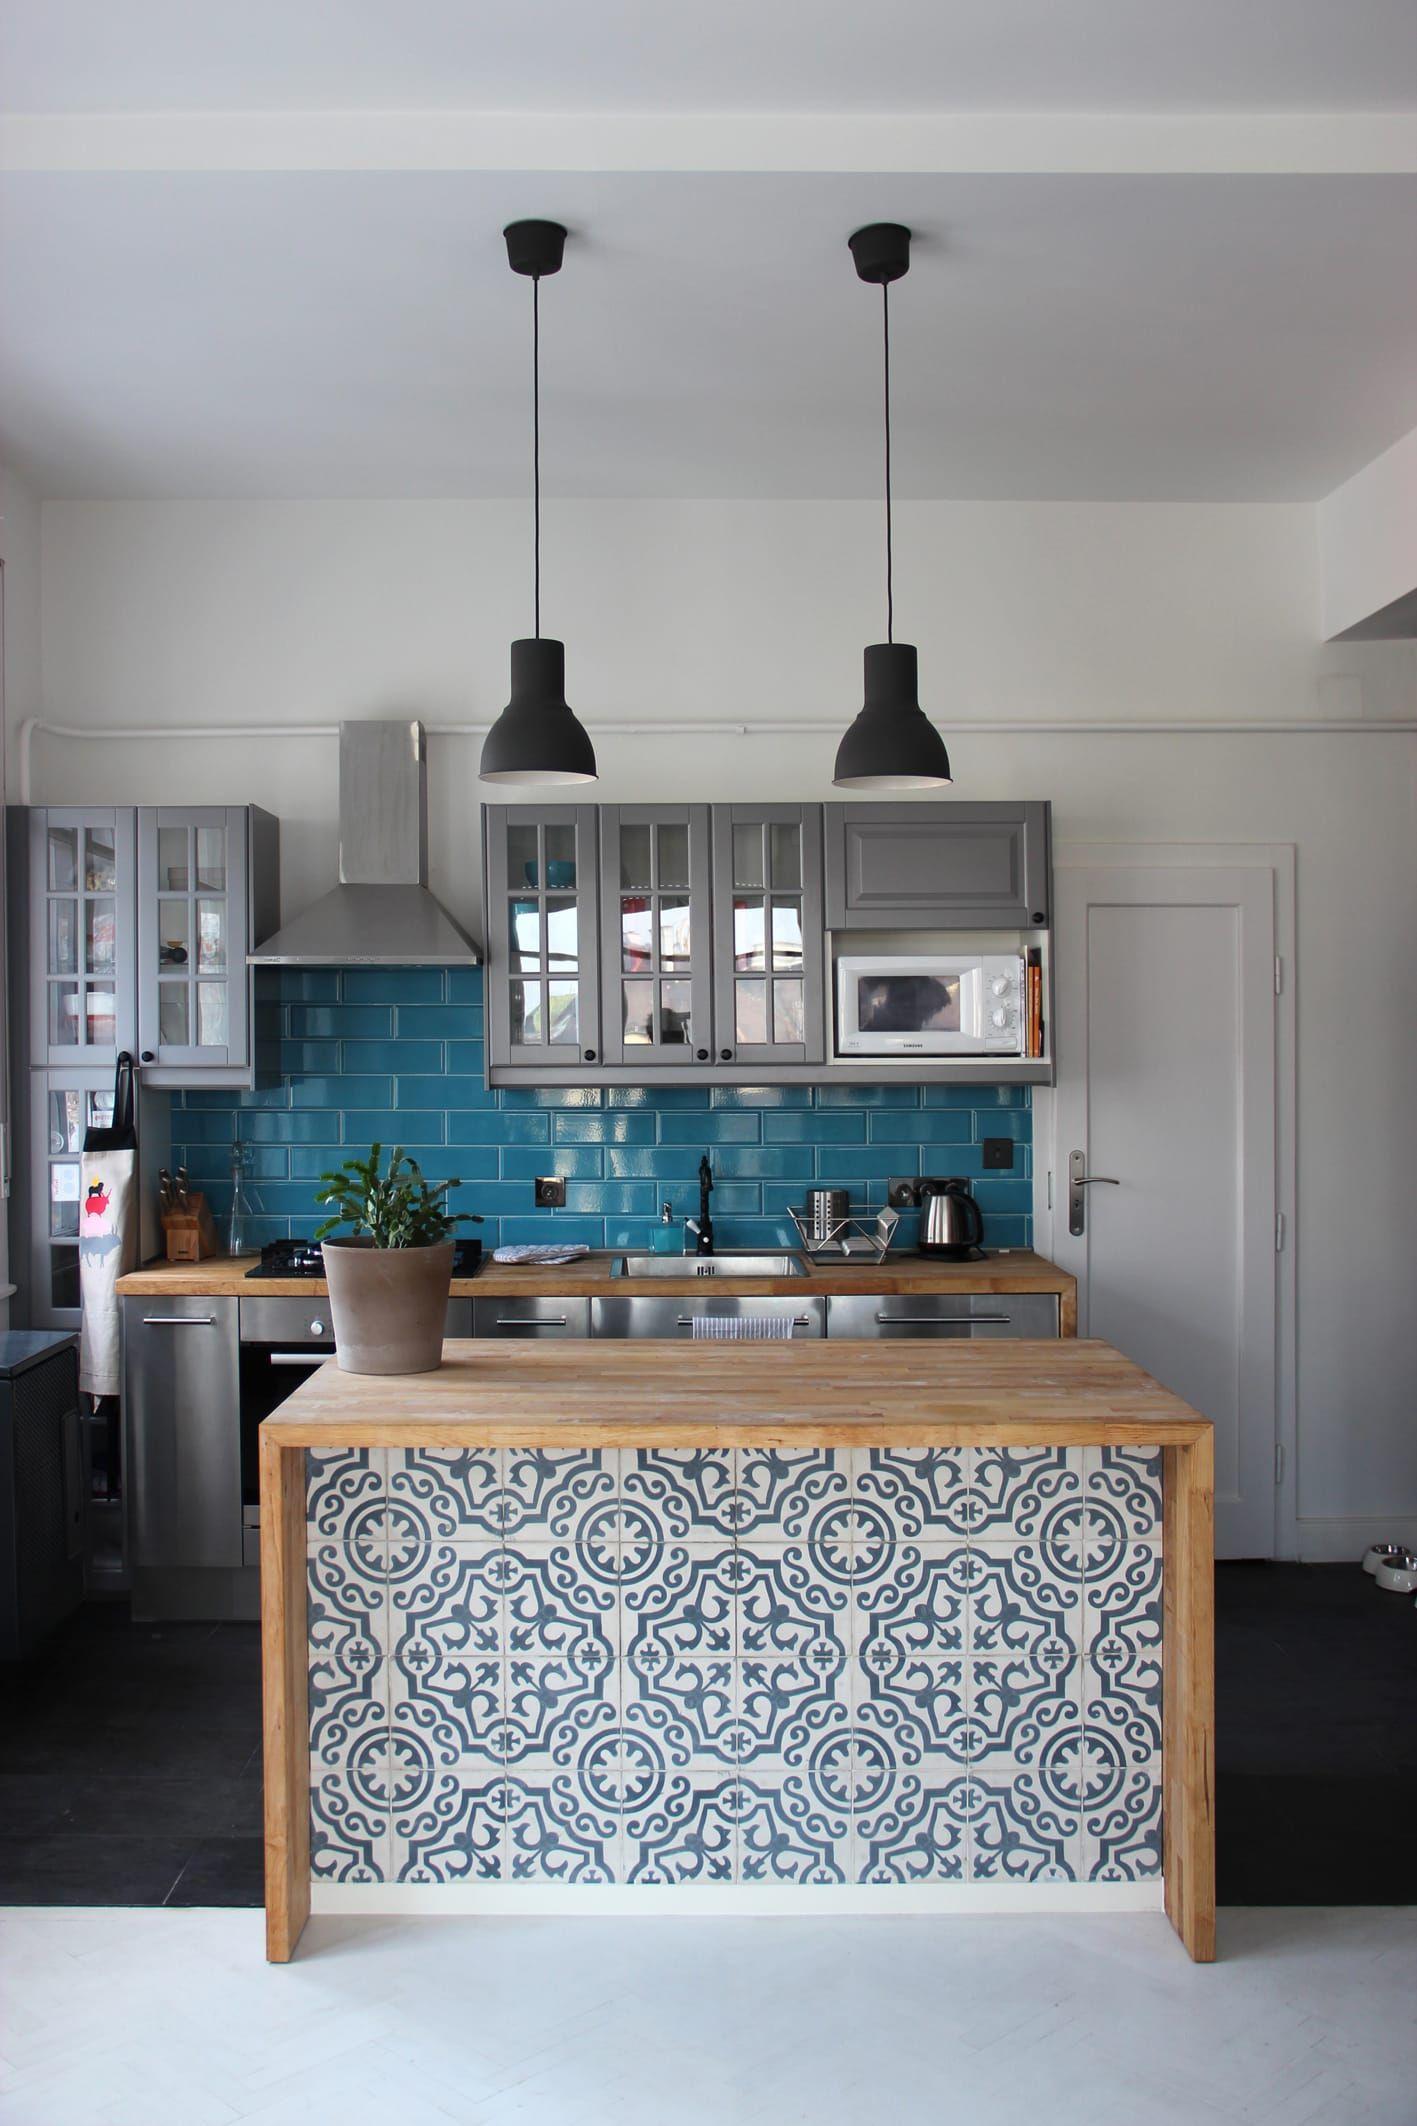 Blue teal wood boho kitchen | Boho Farmhouse: Style | Pinterest ...